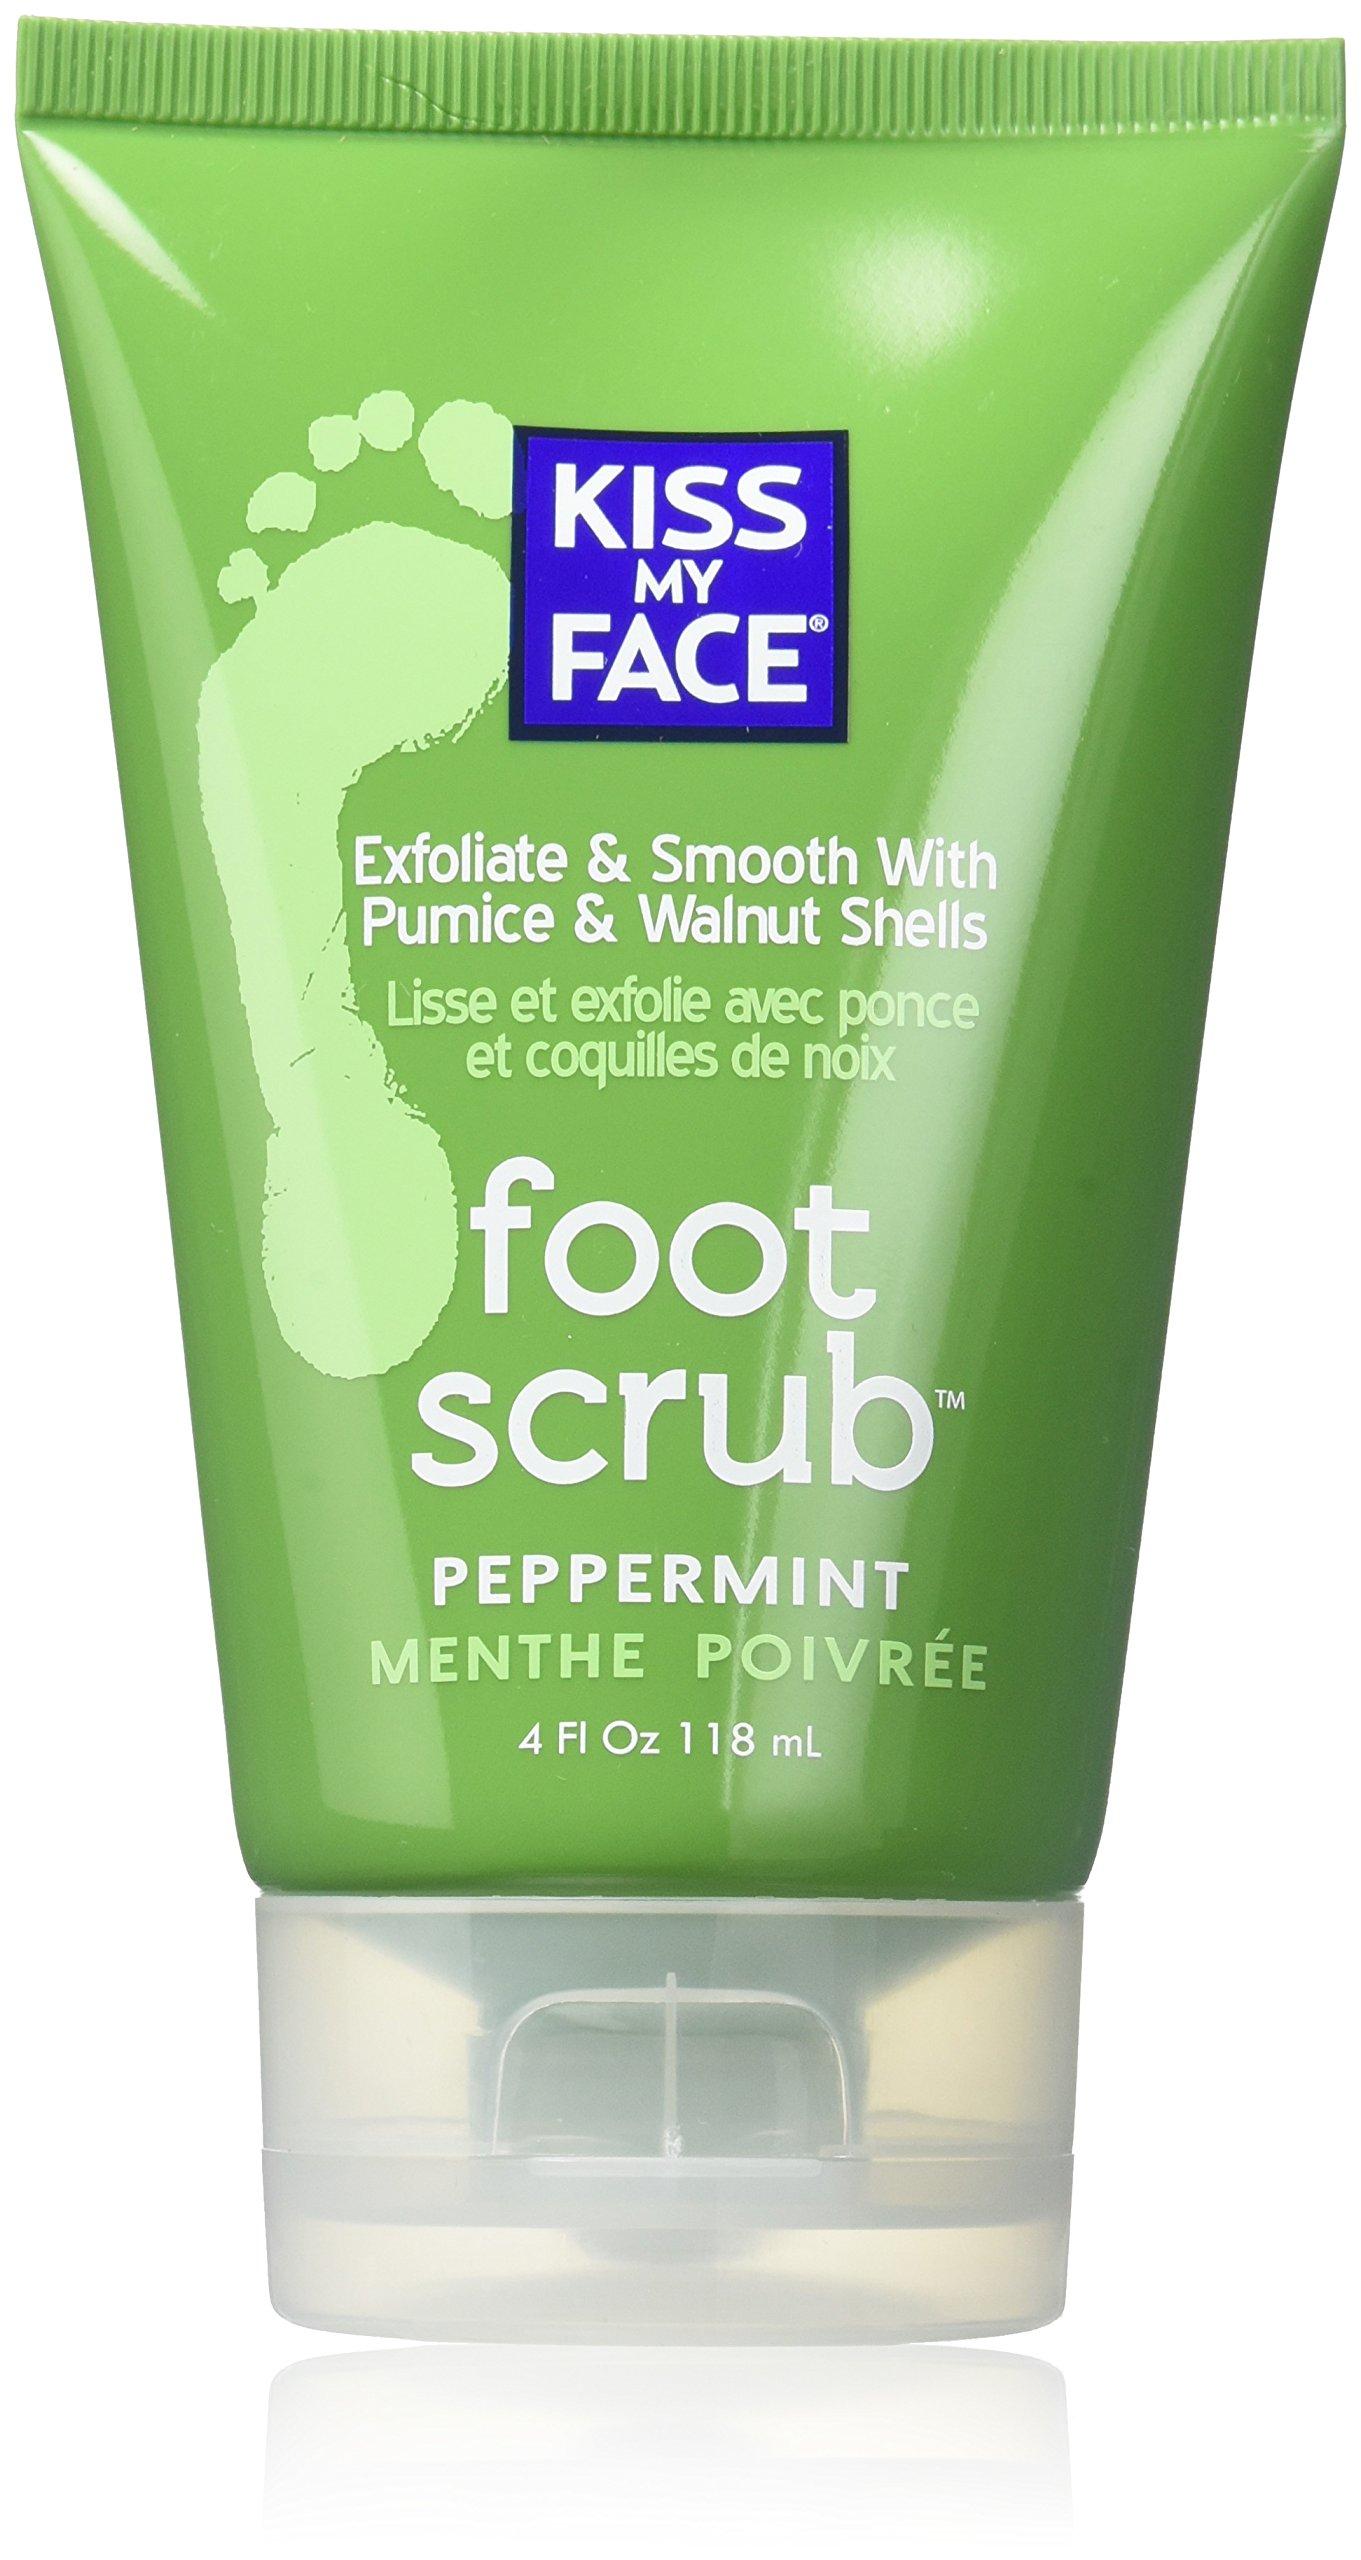 Kiss My Face Luxurious Organic Foot Scrub - Peppermint - 4 oz by Kiss My Face